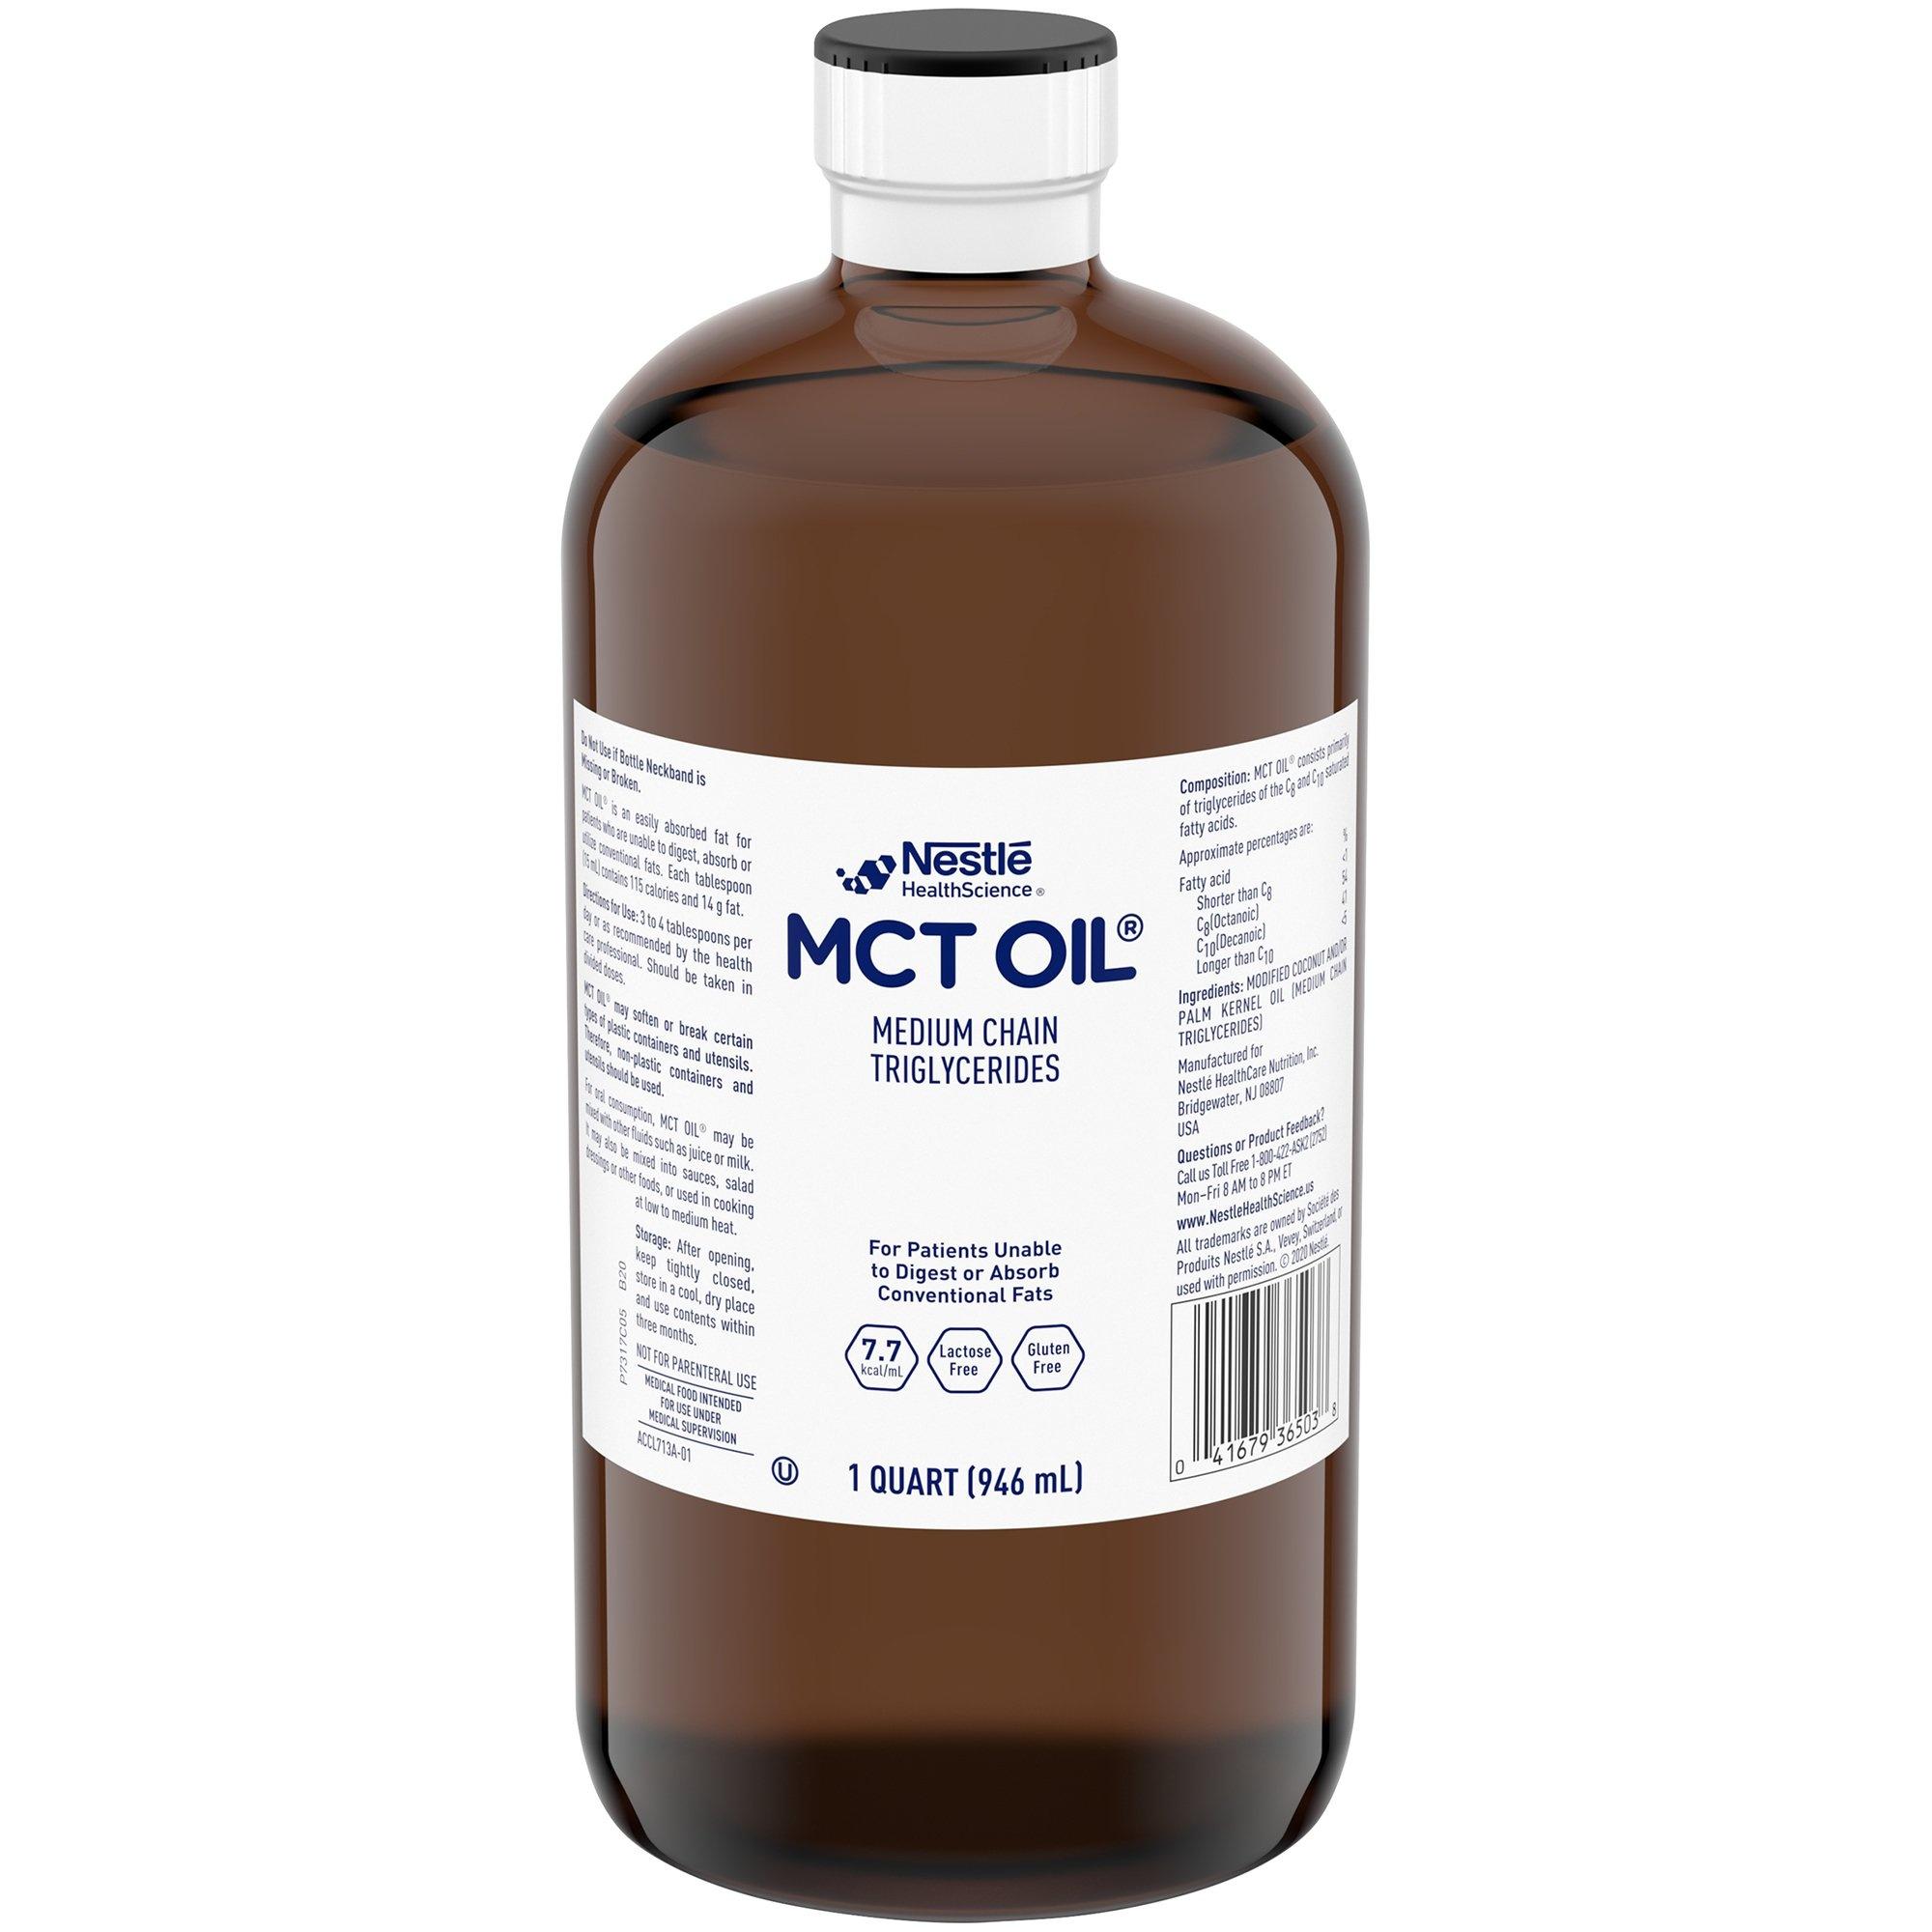 Nestle HealthScience MCT Oil, Unflavored, 32 oz., 00041679365137, 1 Bottle